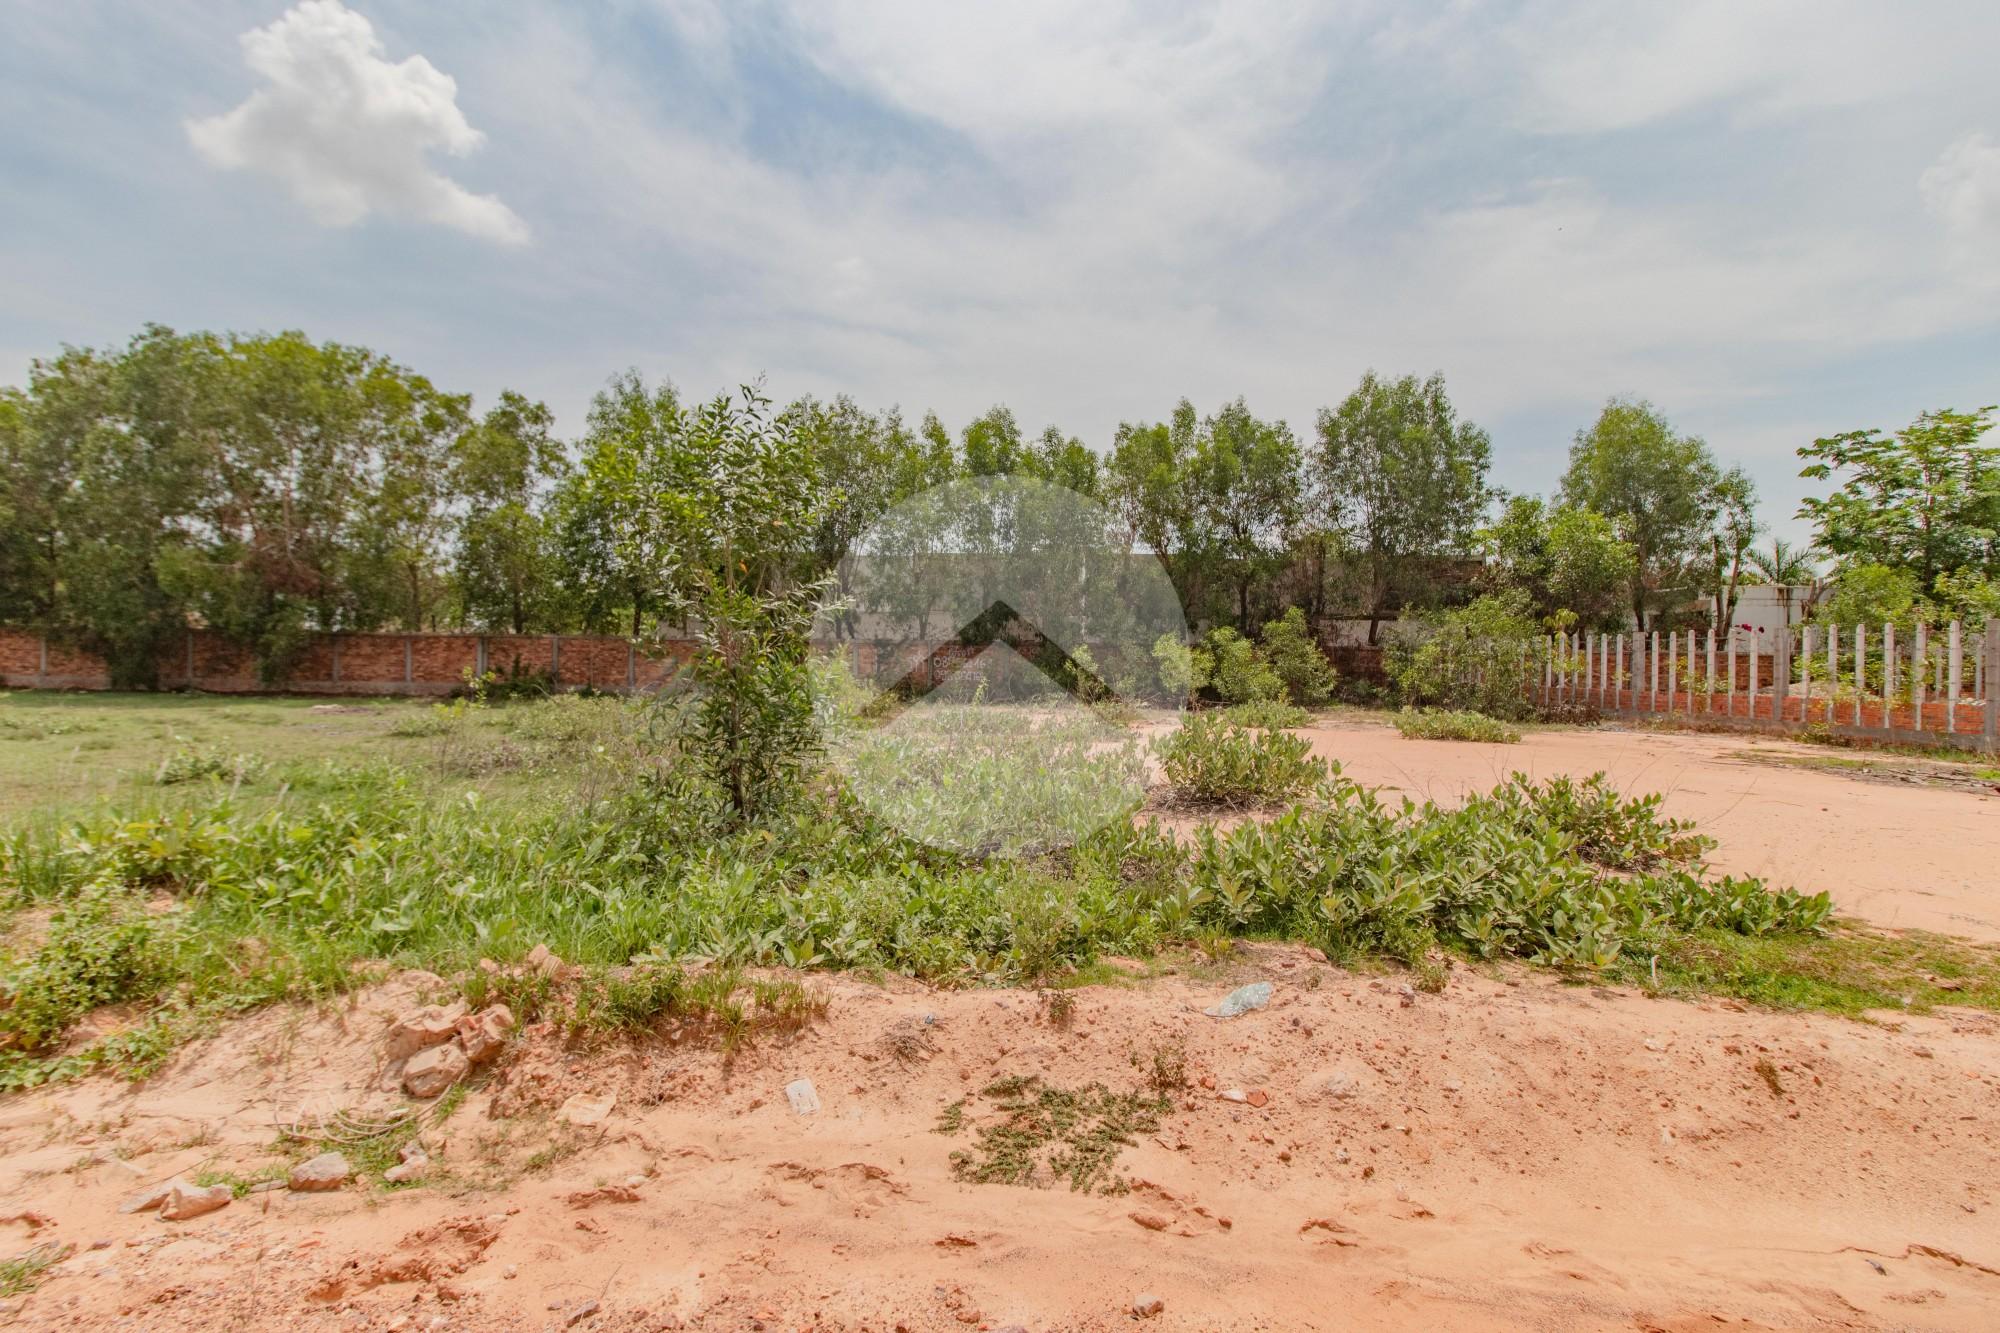 298 Sqm Residential Land For Sale - Svay Dangkum, Siem Reap